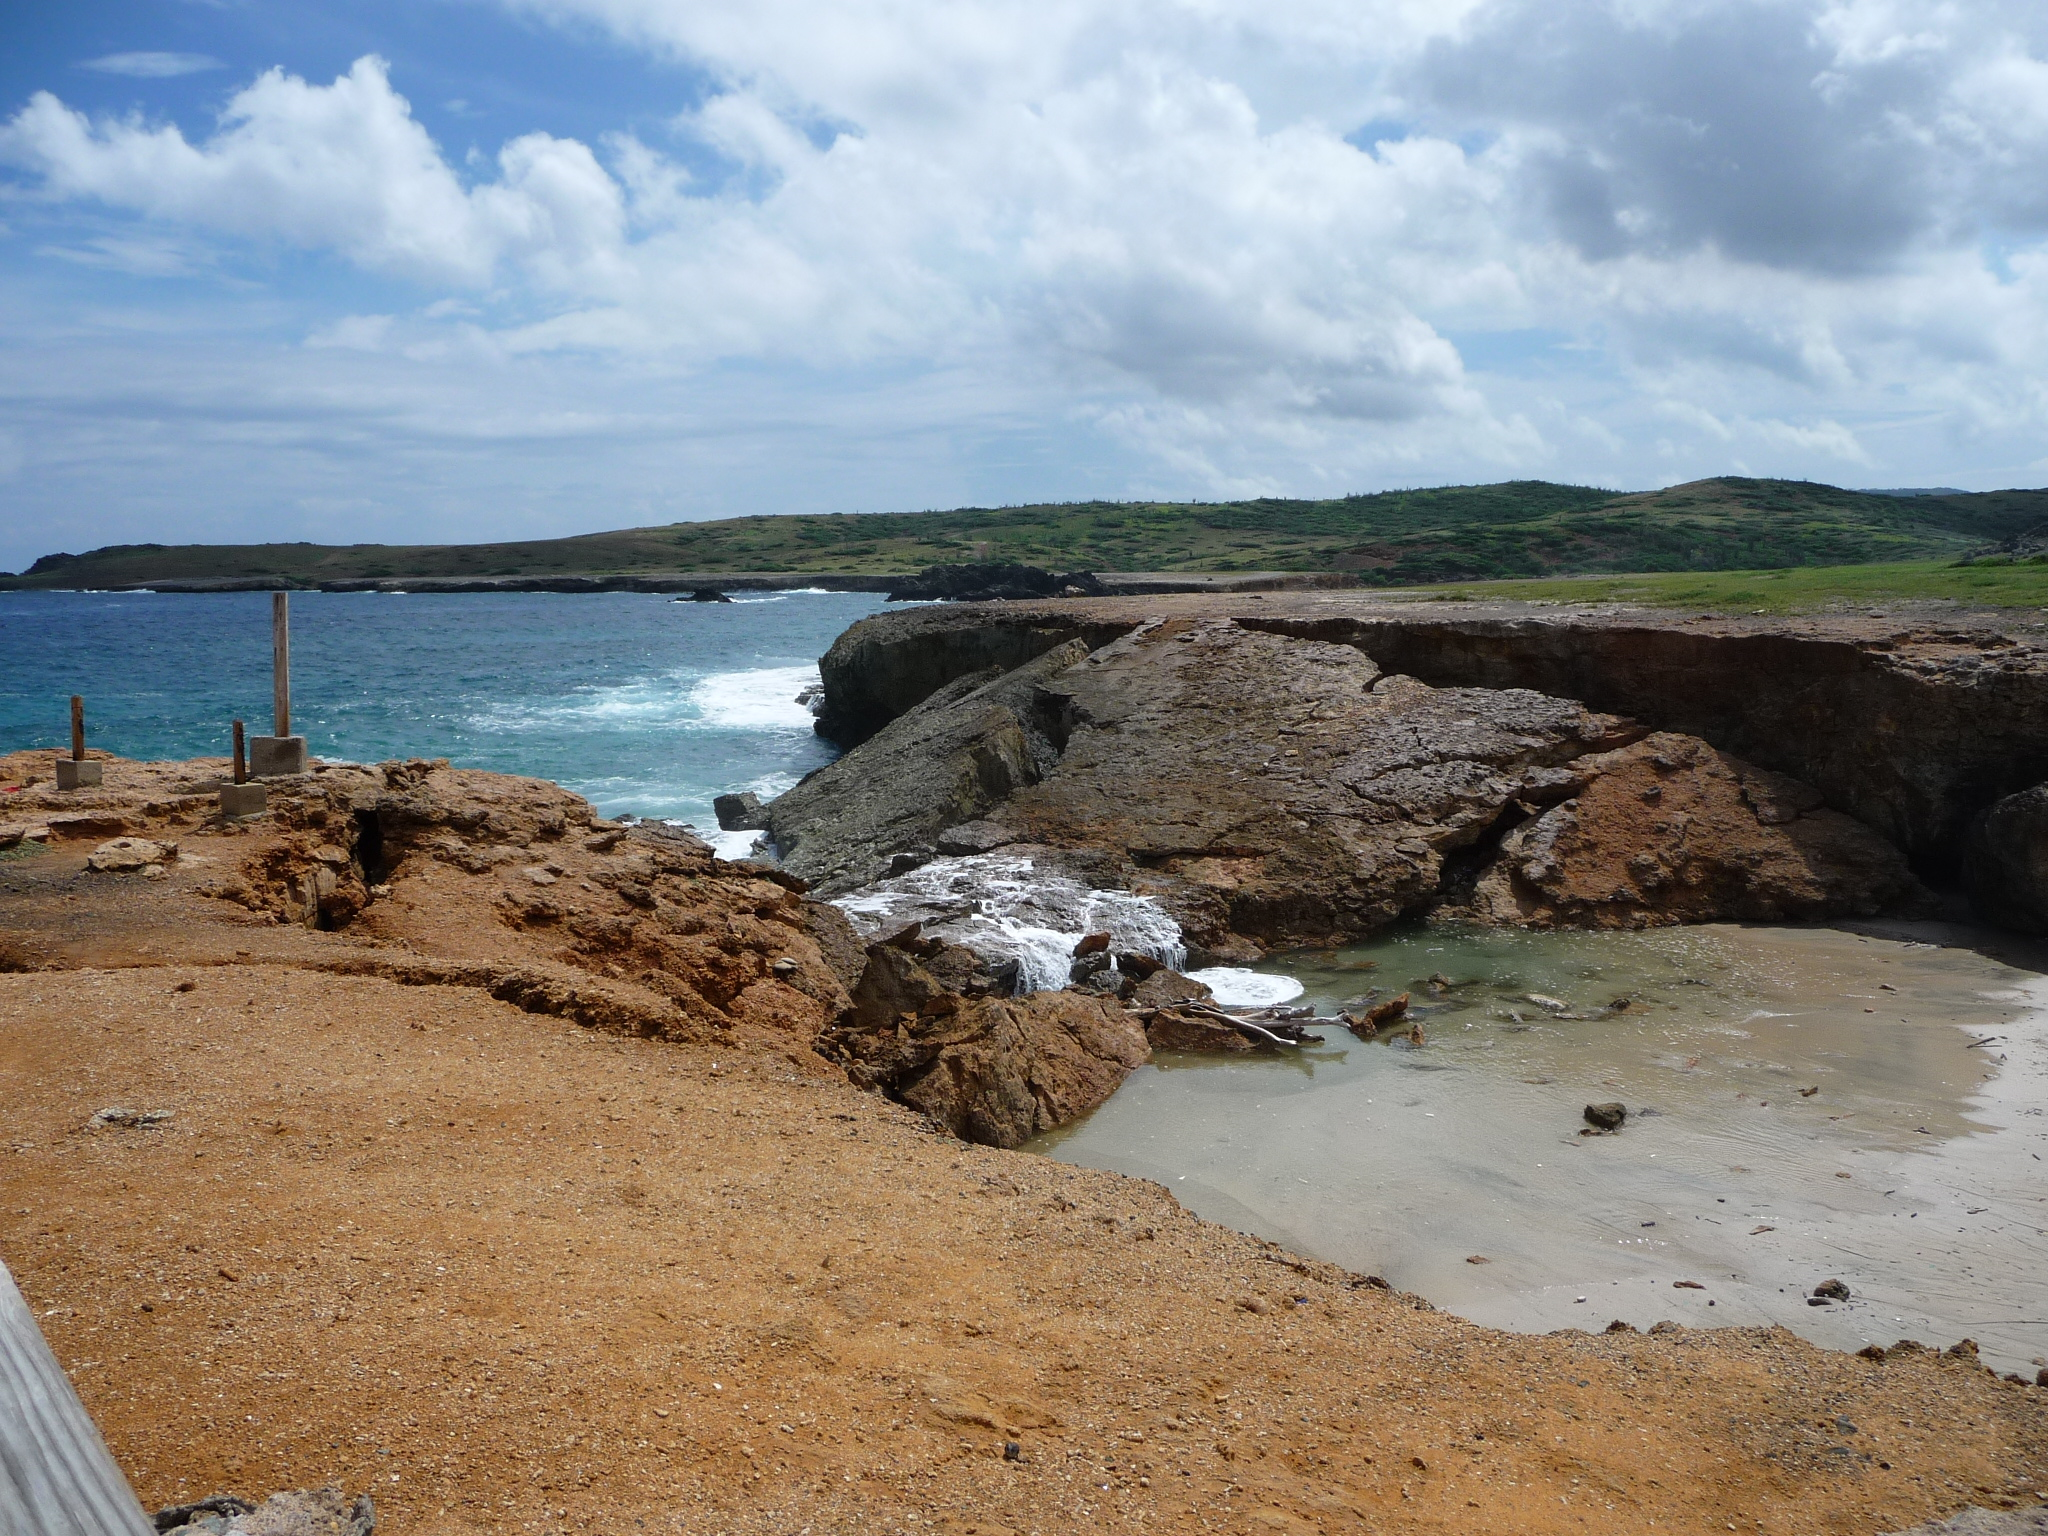 Aruba More Mizsuzee S Musings